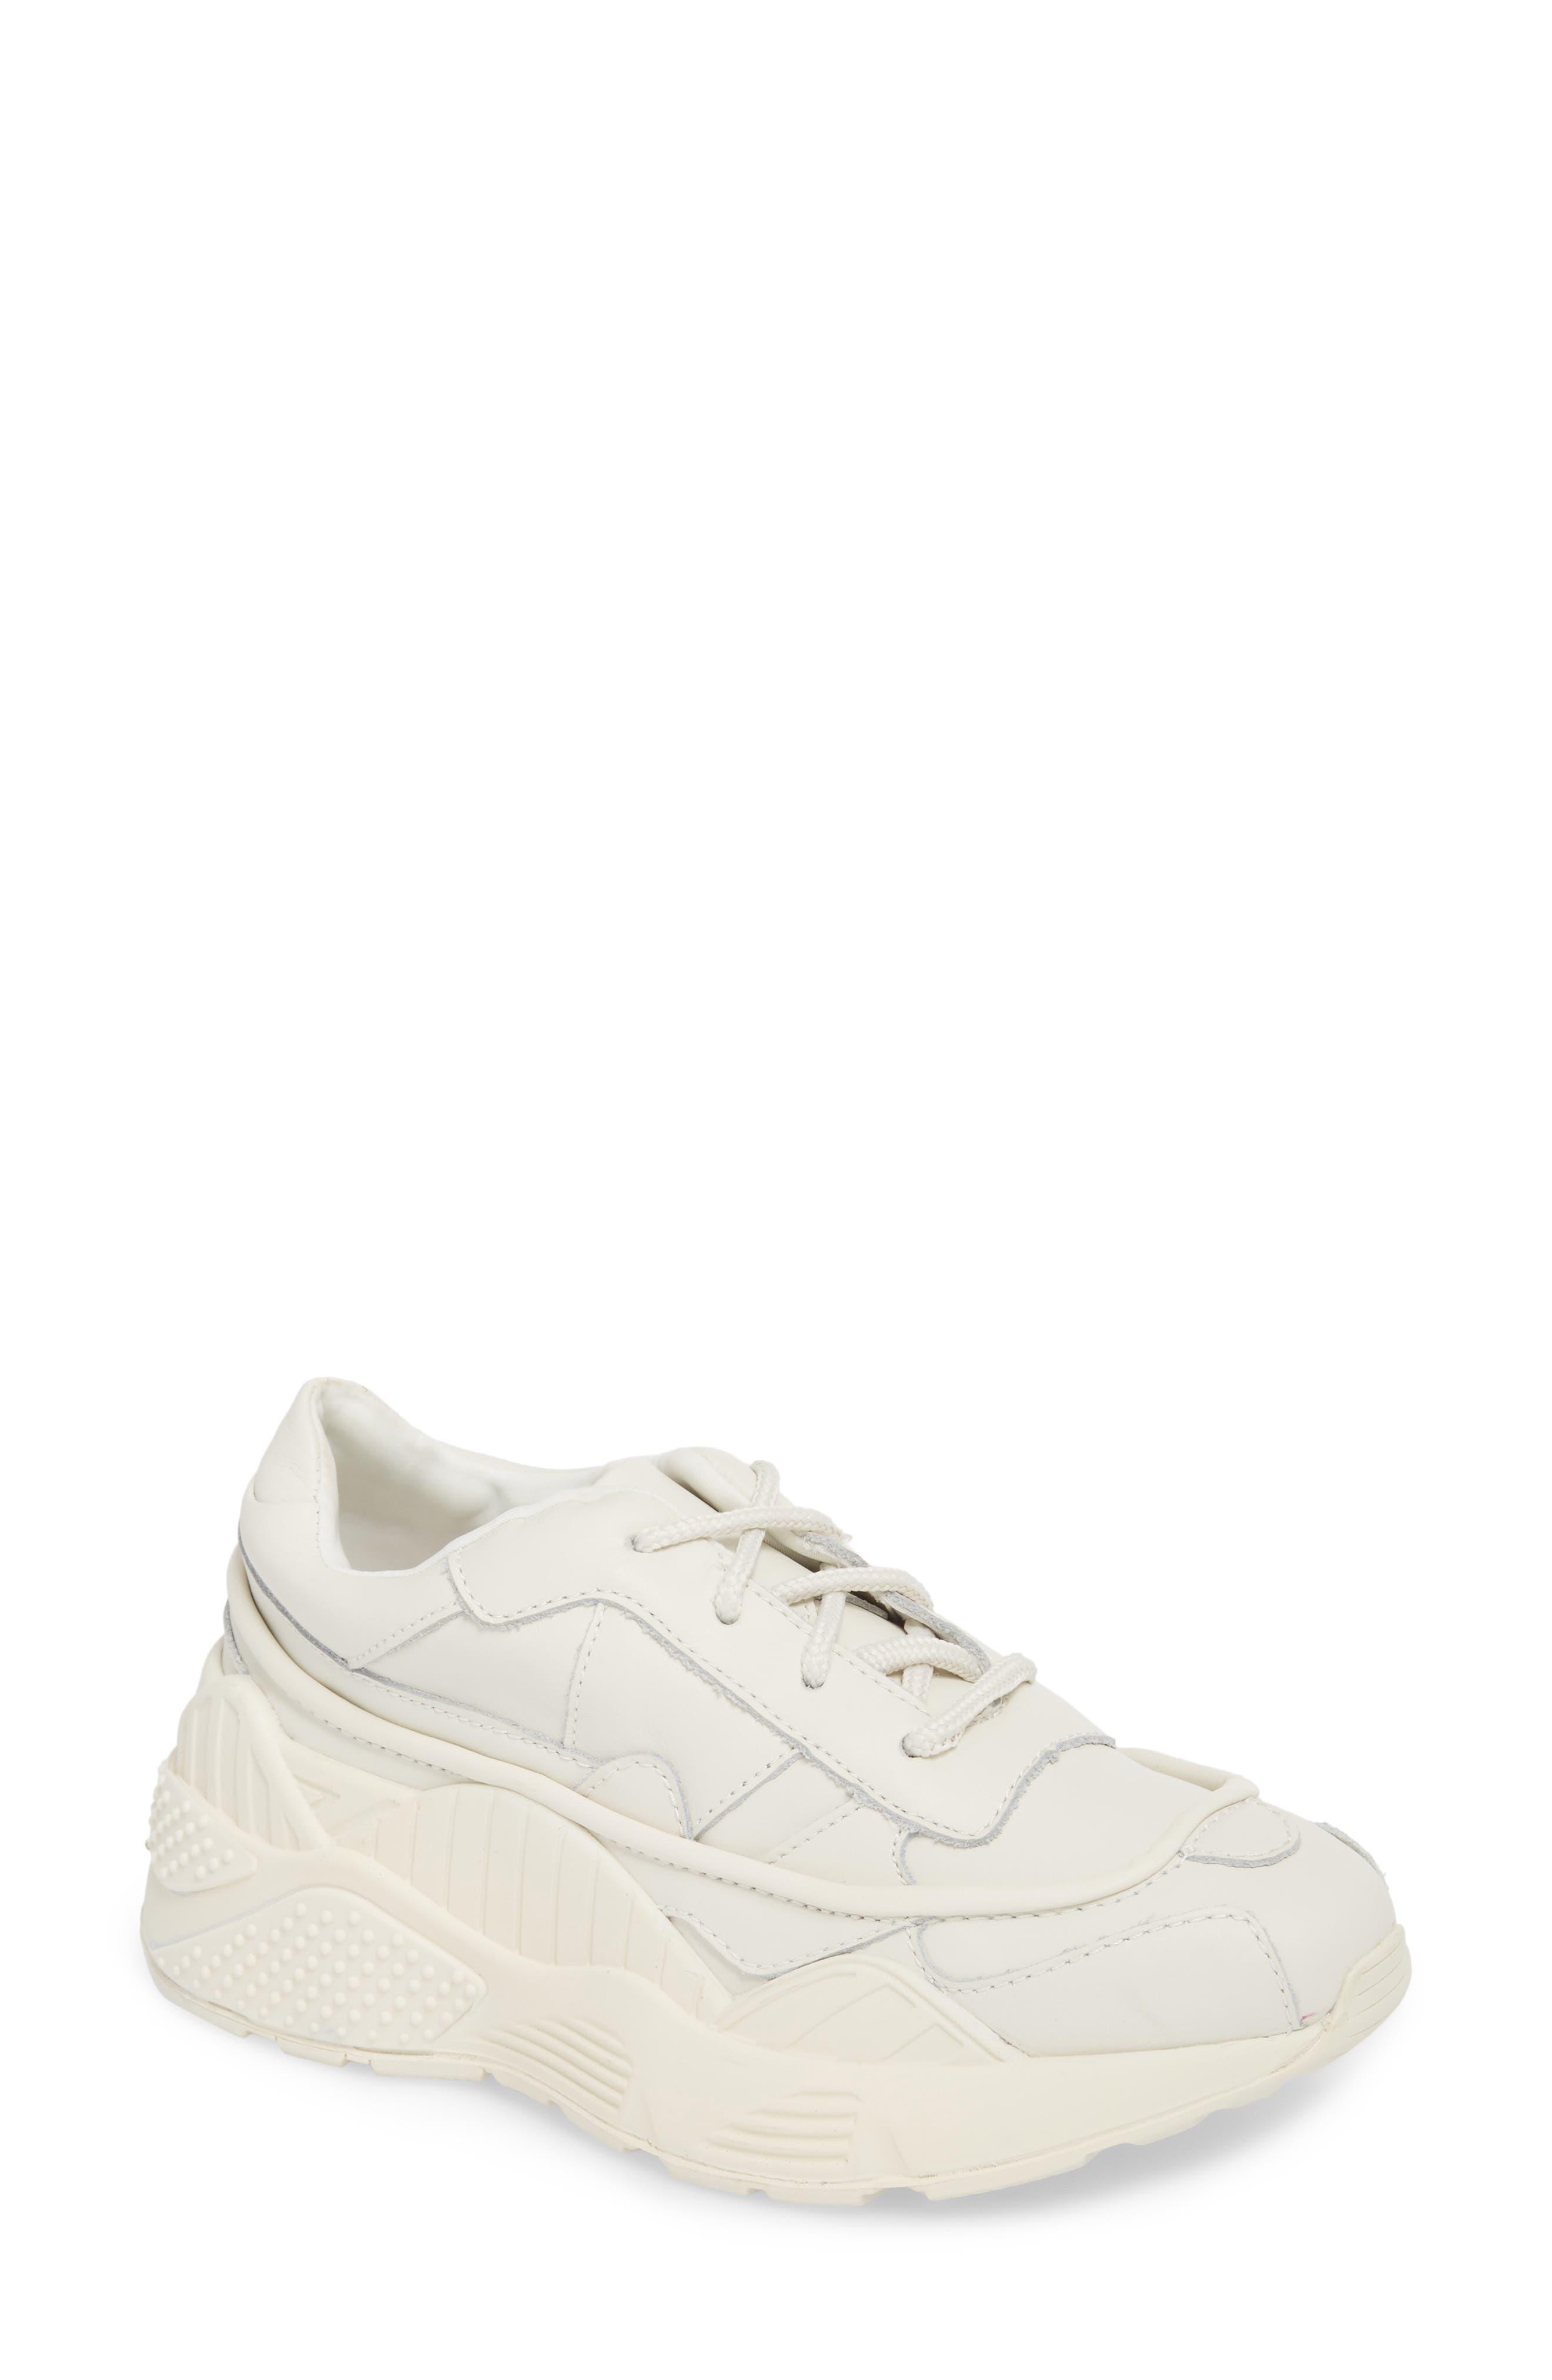 Jeffrey Campbell Women's Hmdi Platform Sneaker dbrvJLlP